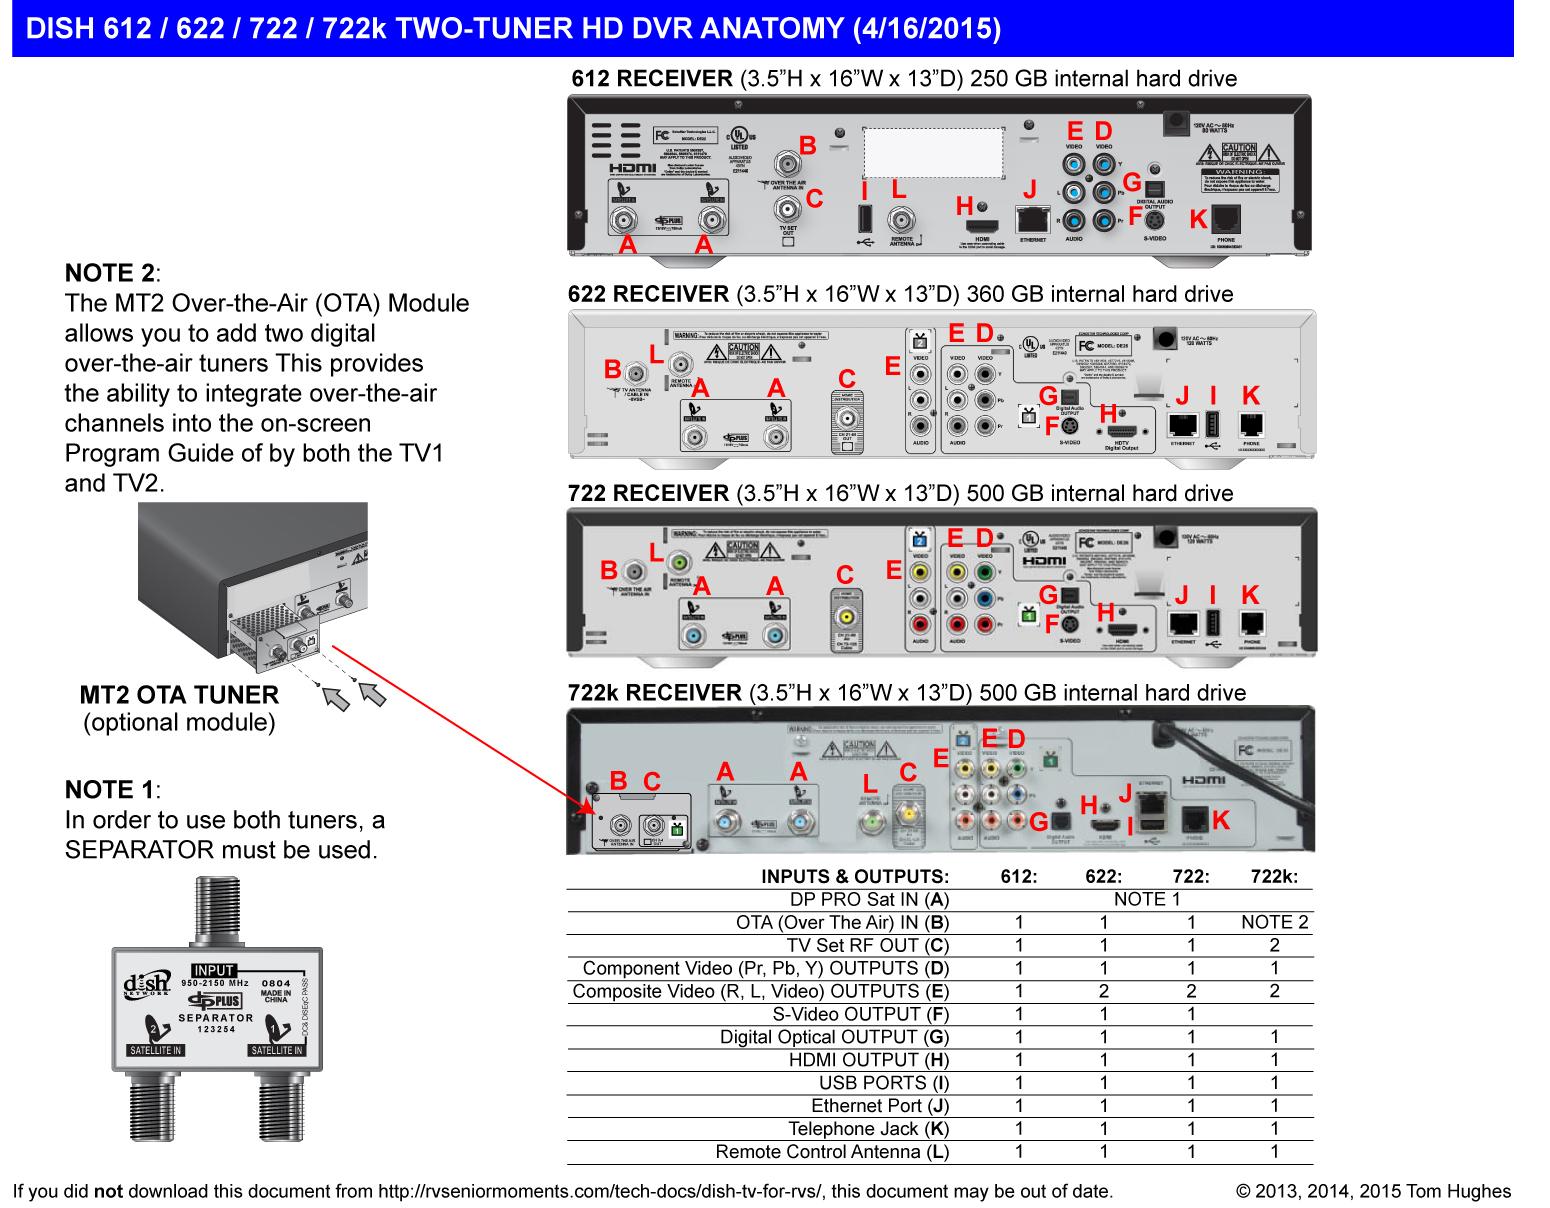 Wiring Diagram For Dish Network Dish Tv For Rvs Rvseniormoments